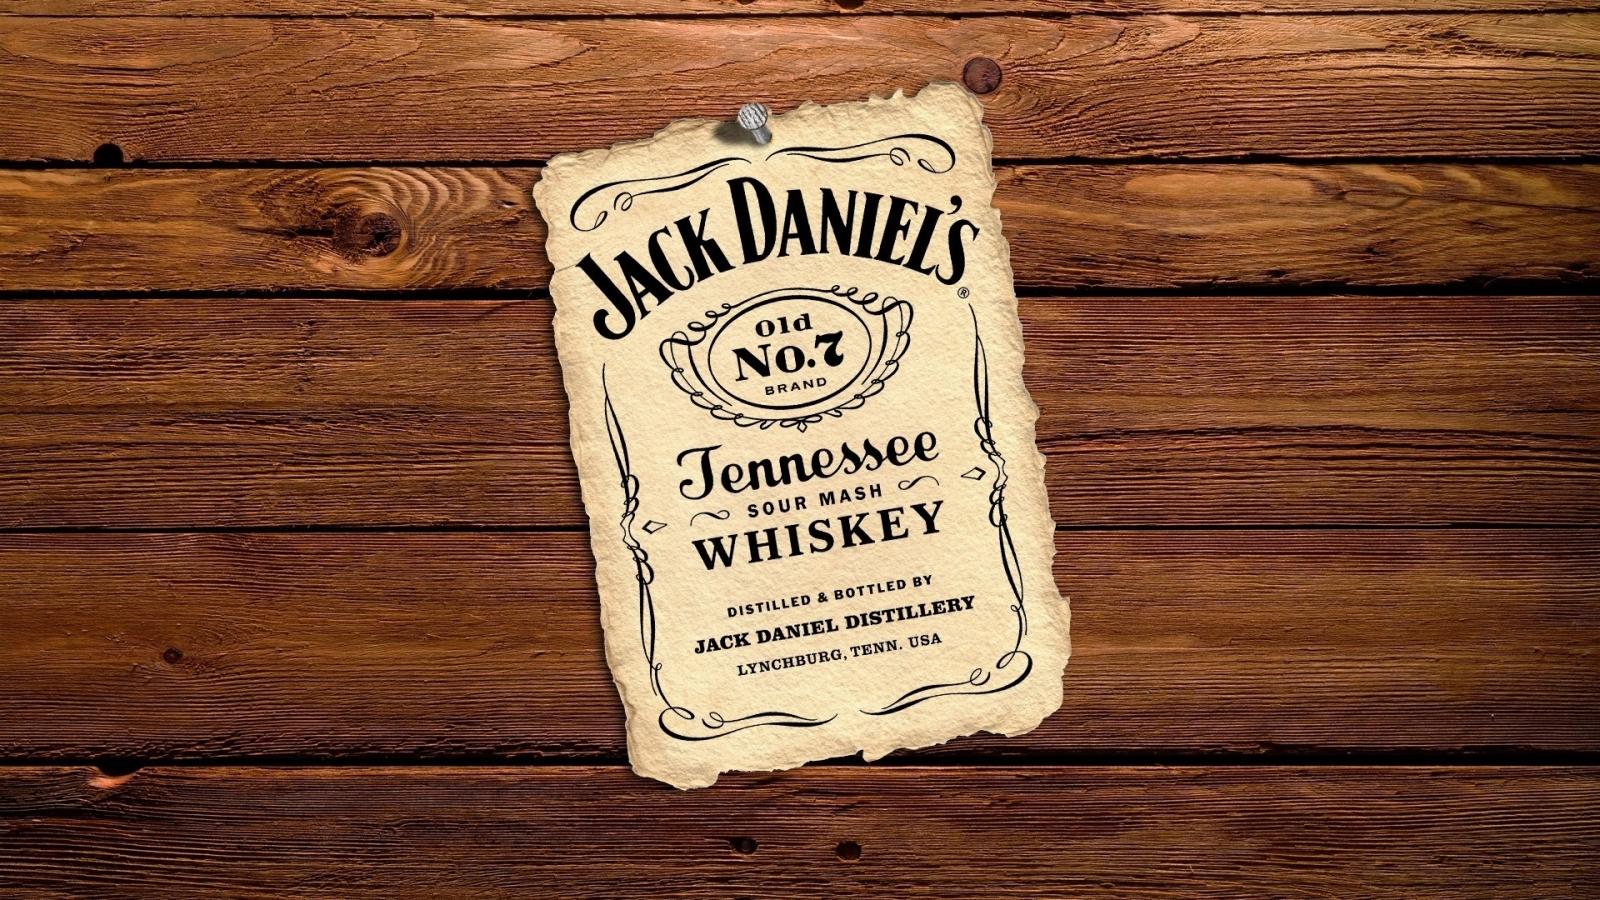 Jack Daniels Flyer Hd Wallpaper Wallpaperfx